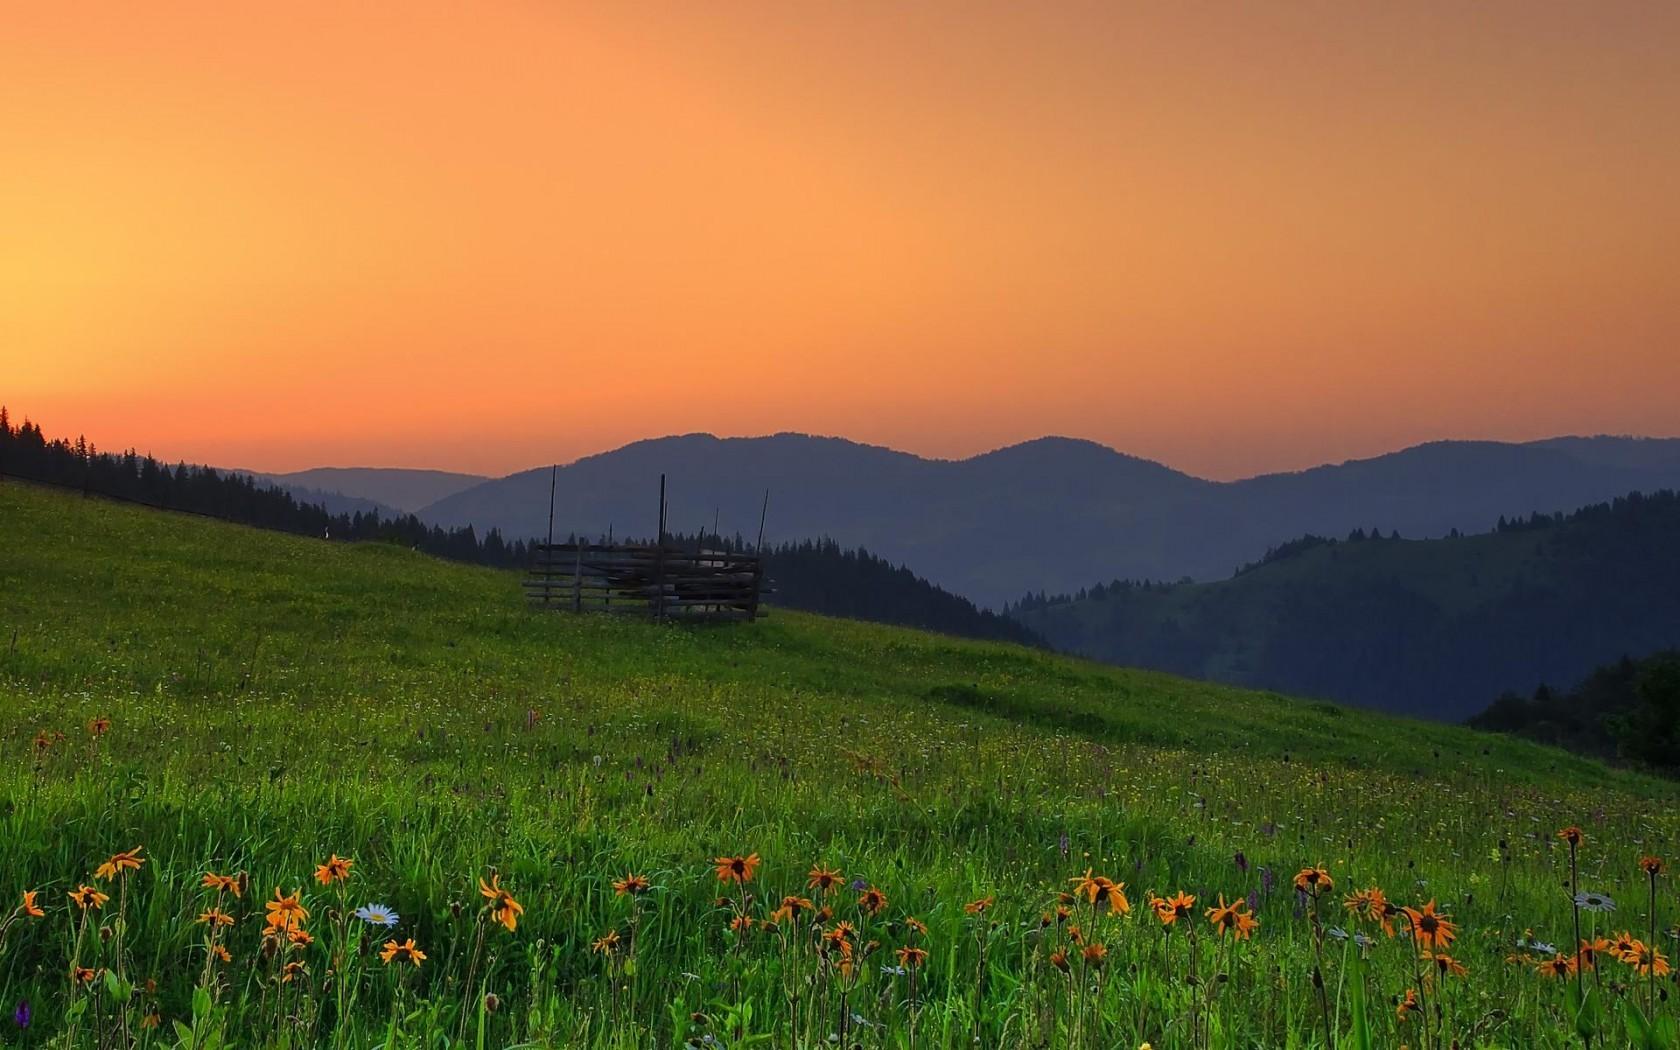 1680x1050_romania_hills_sunset_field_flowers_landscape_photos